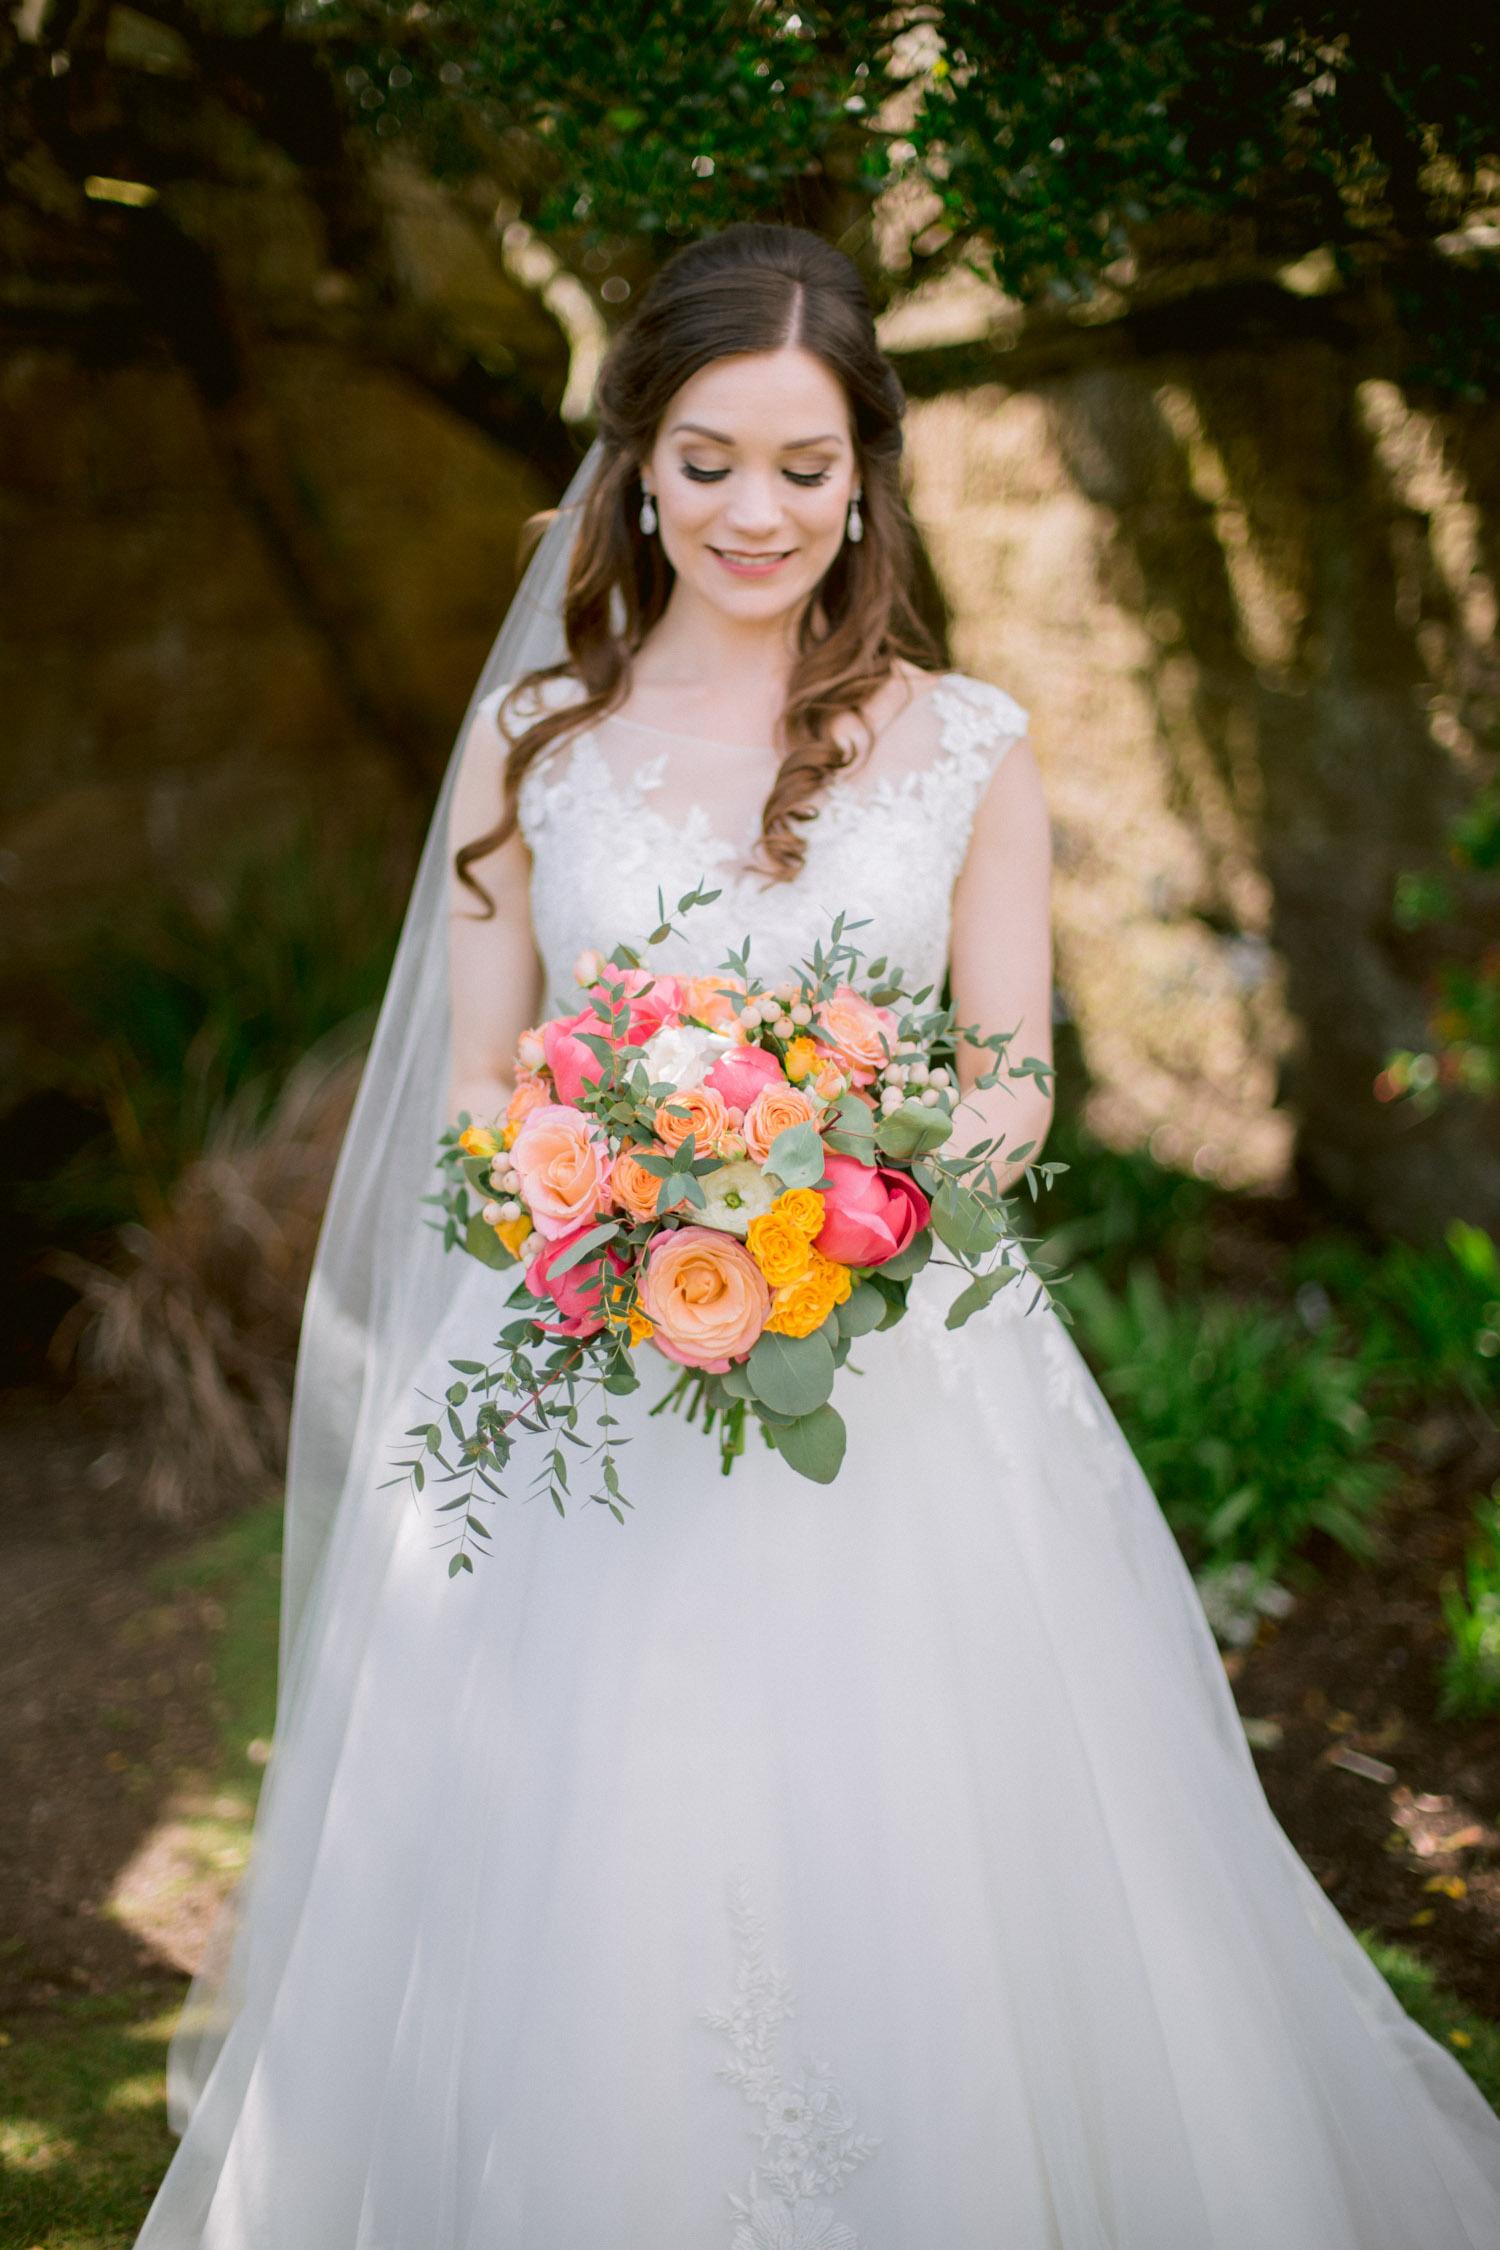 Bride with Orange rose wedding bouquet | Culzean Castle Ayrshire Bride Photography